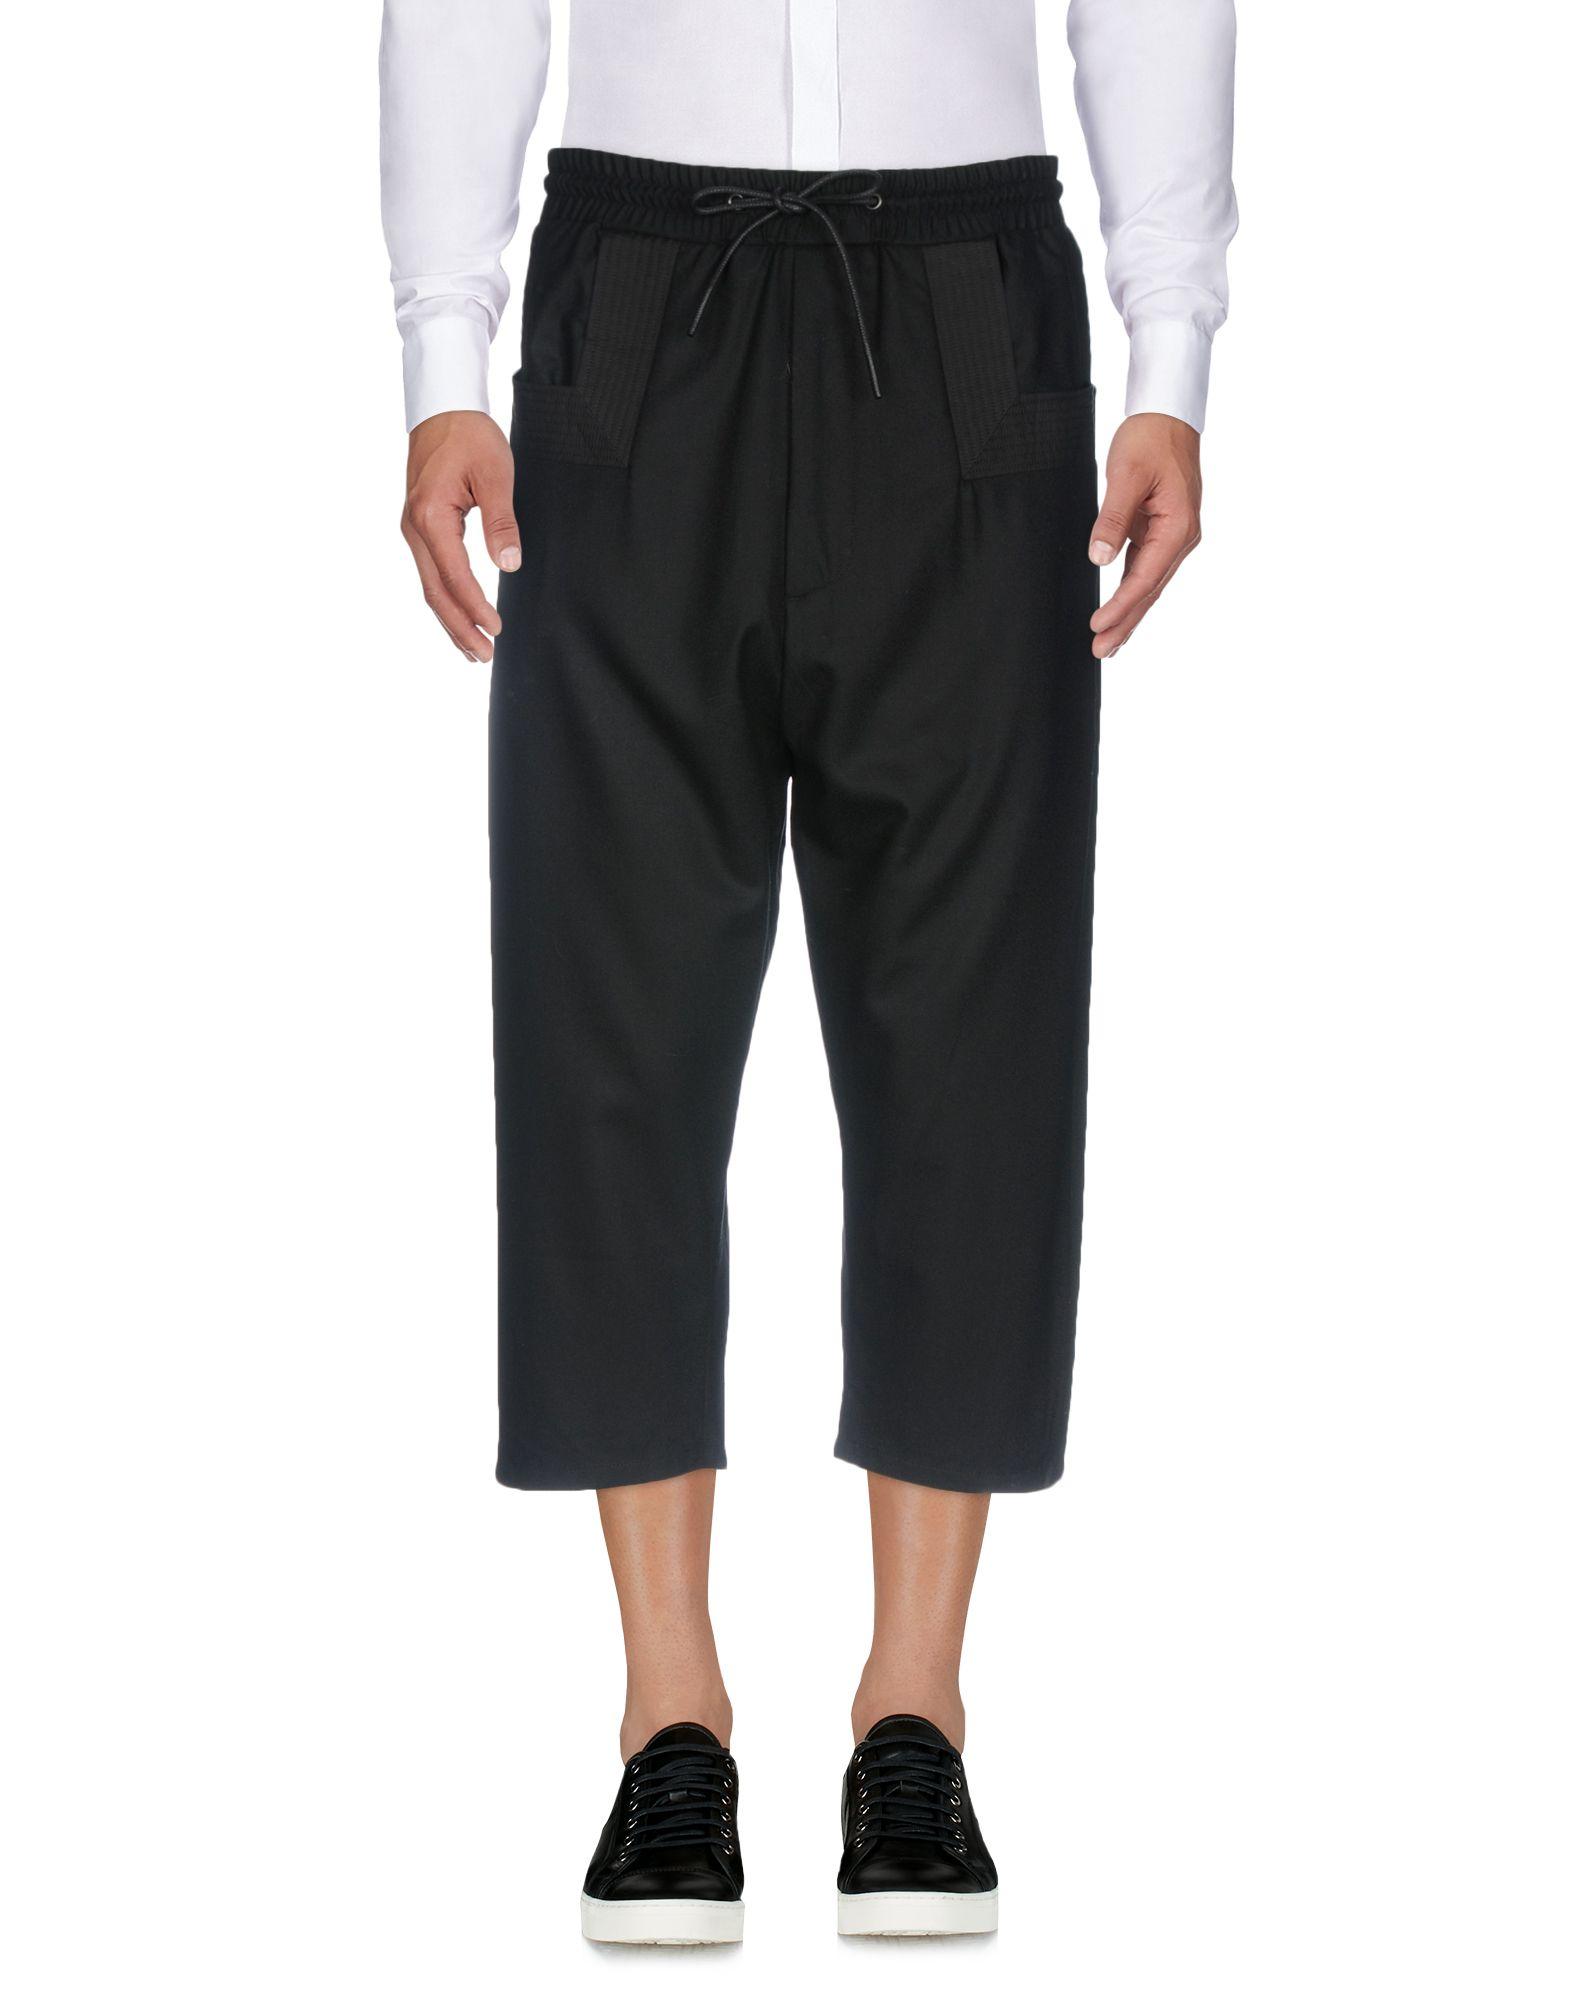 Pantalone Capri D.Gnak By Kang.D Uomo - Acquista online su